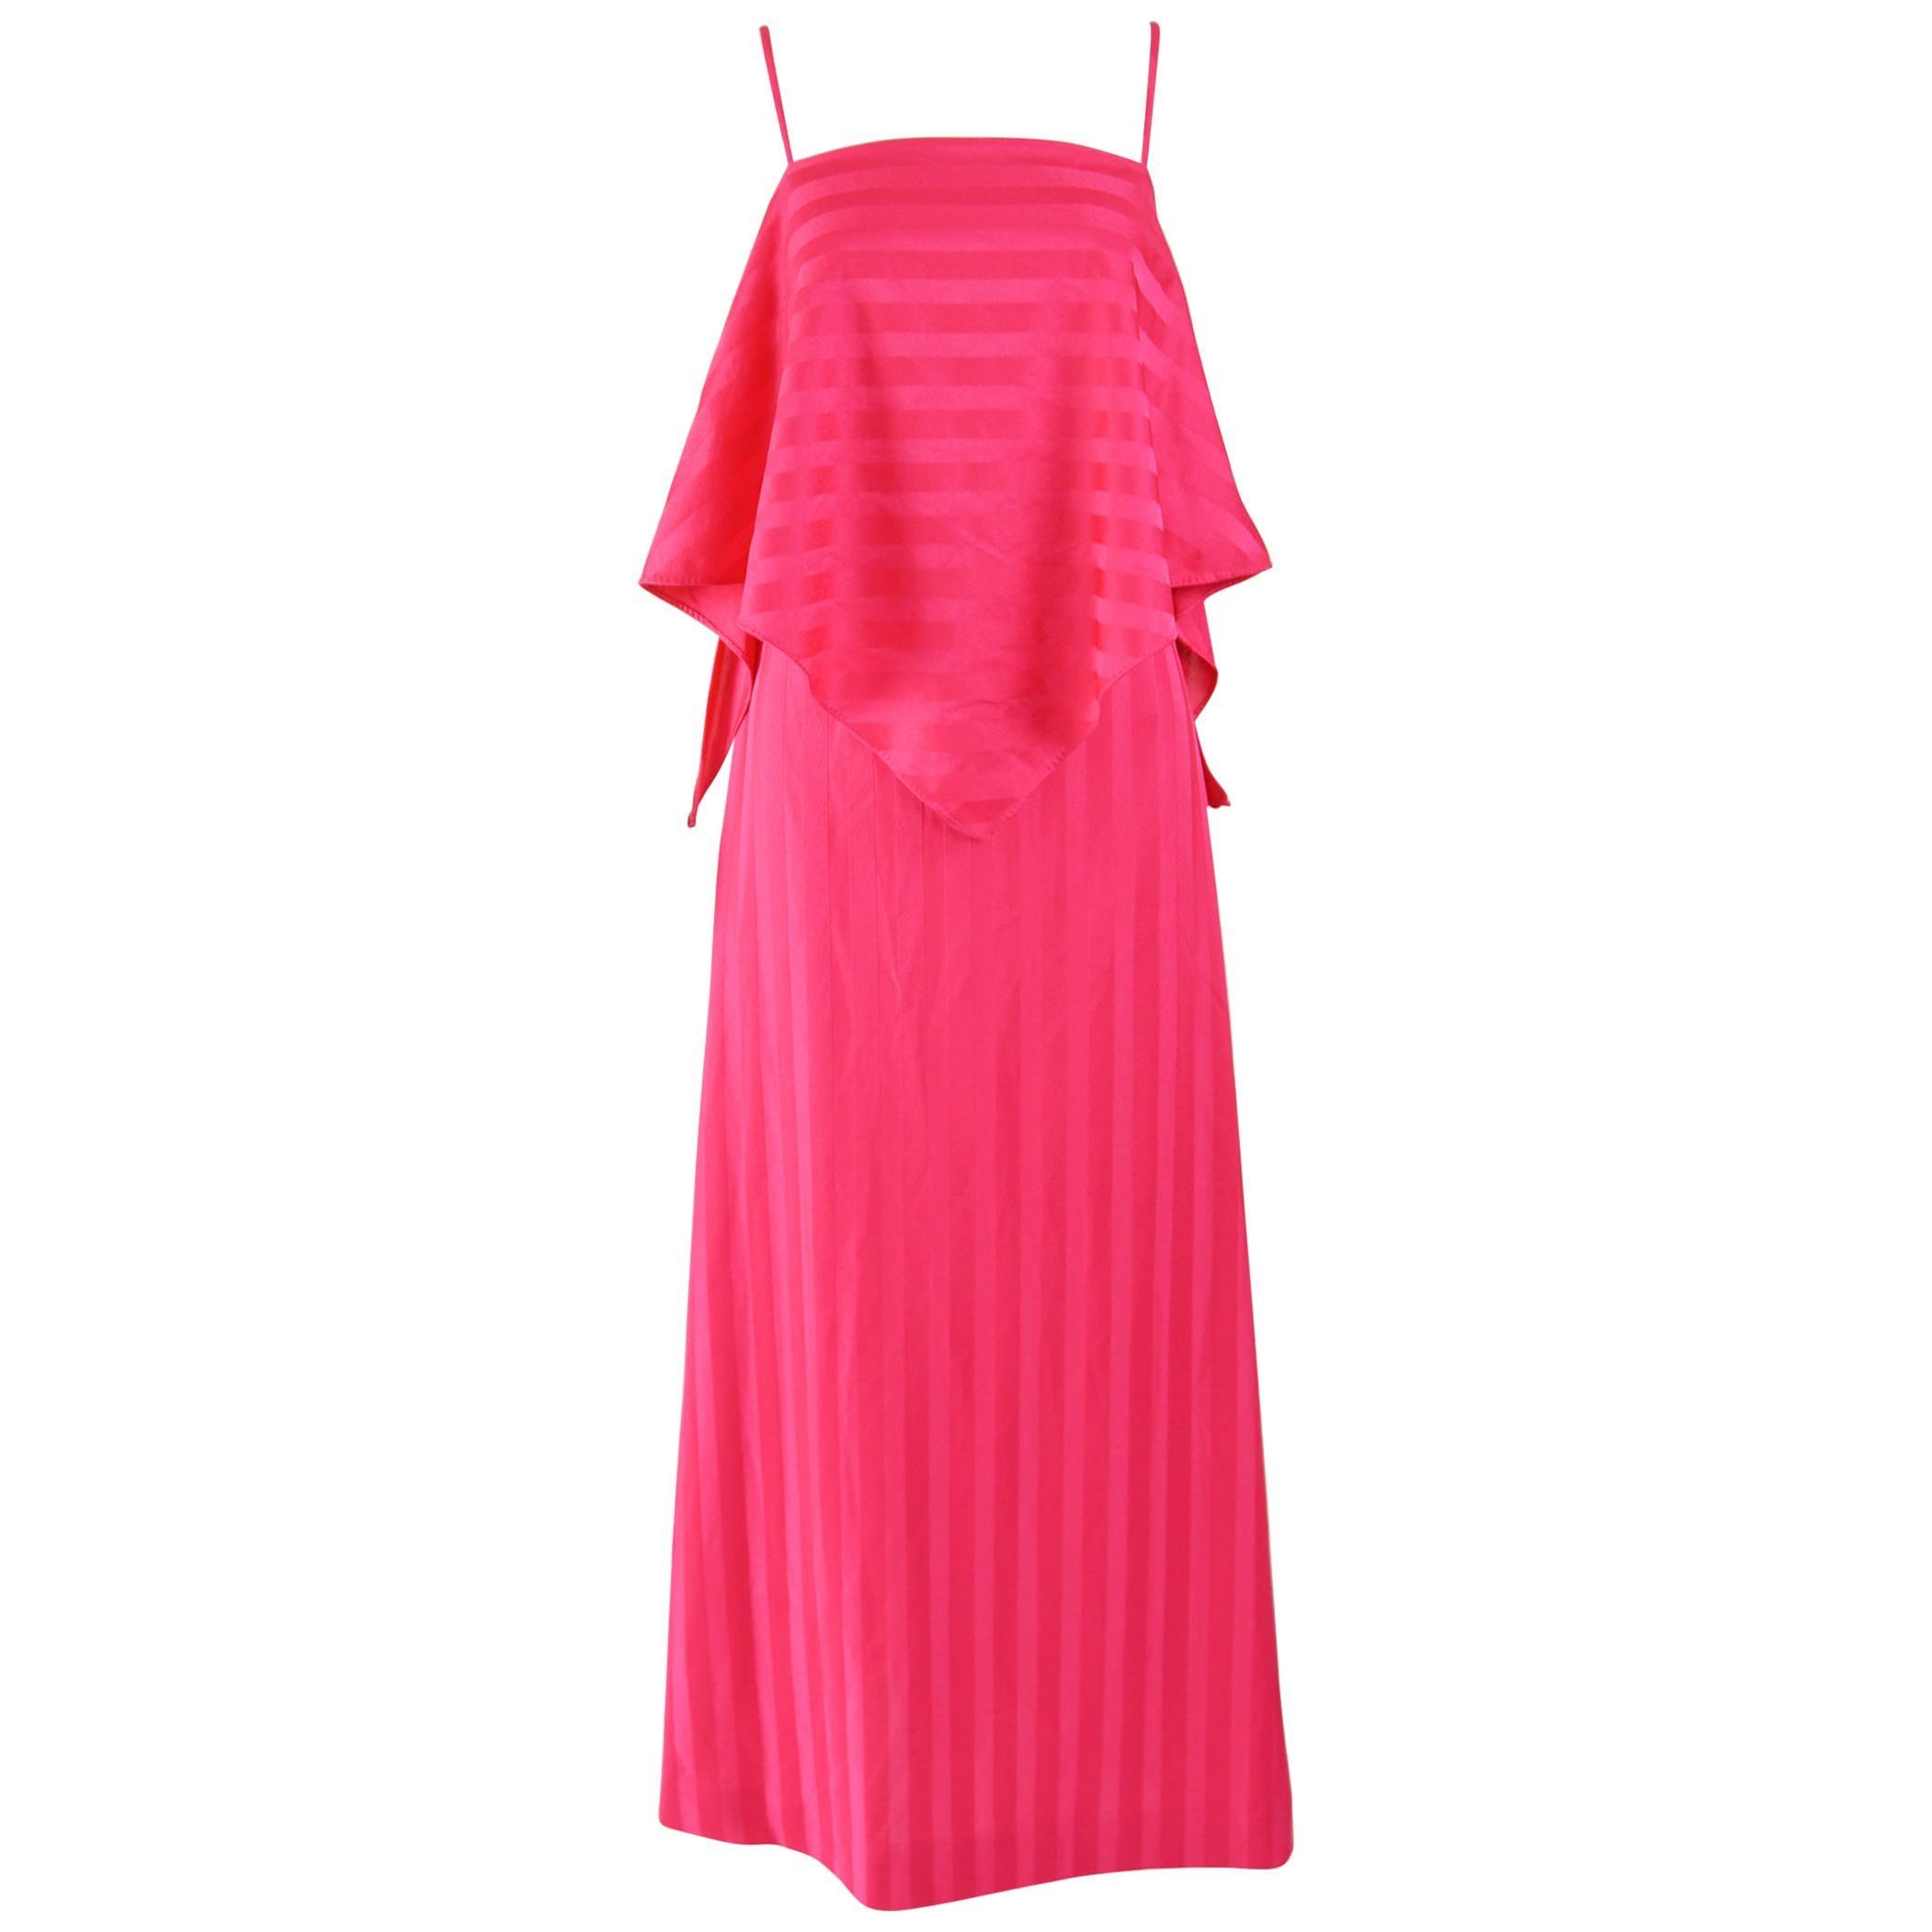 1970s Vintage Pink Maxi Dress